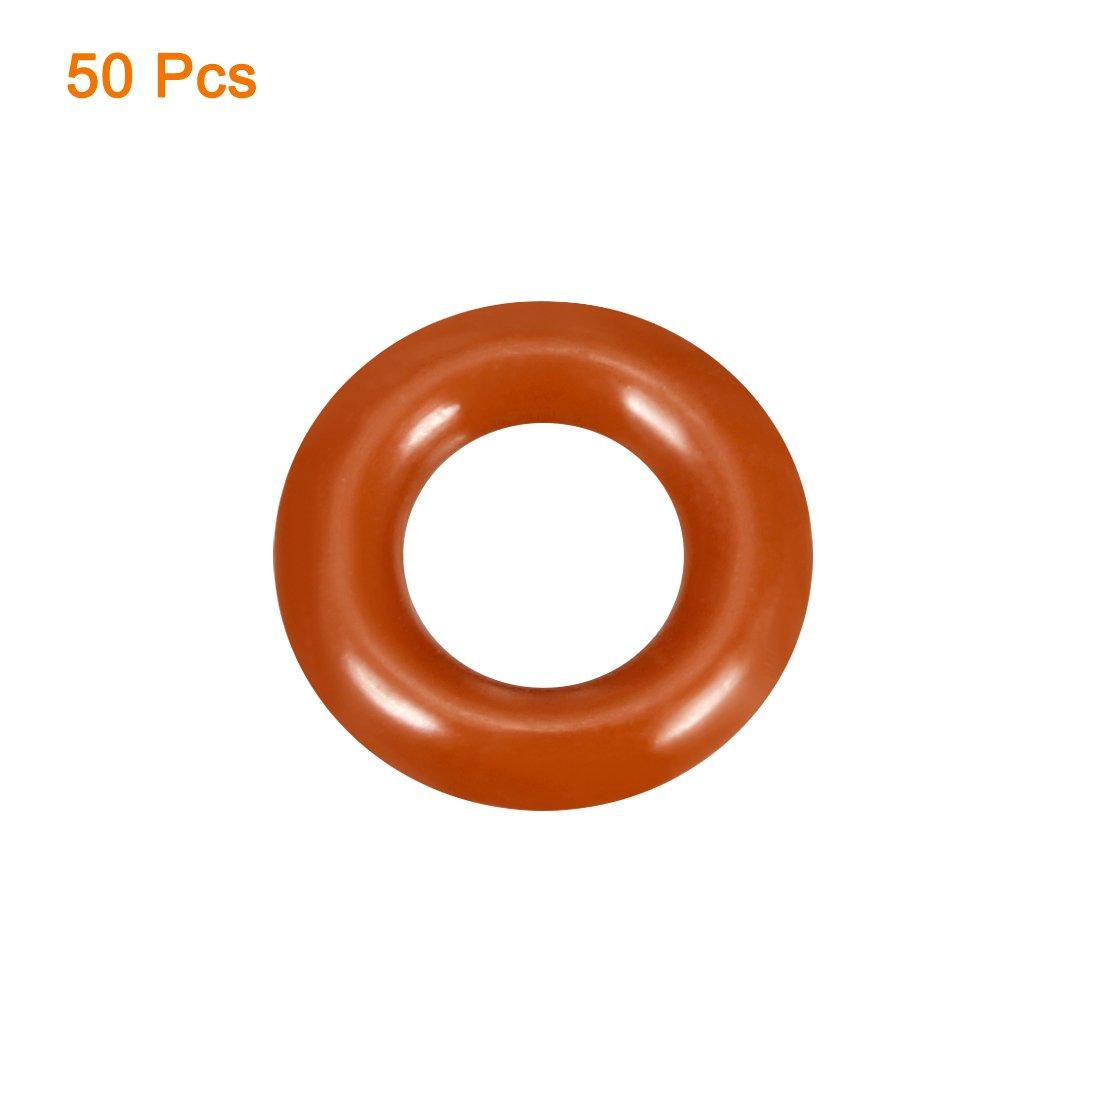 130.2mm Inner Diameter 1PCS 135mm Outside Diameter sourcingmap Silicone O-Ring 2.4mm Width VMQ Seal Rings Sealing Gasket Red